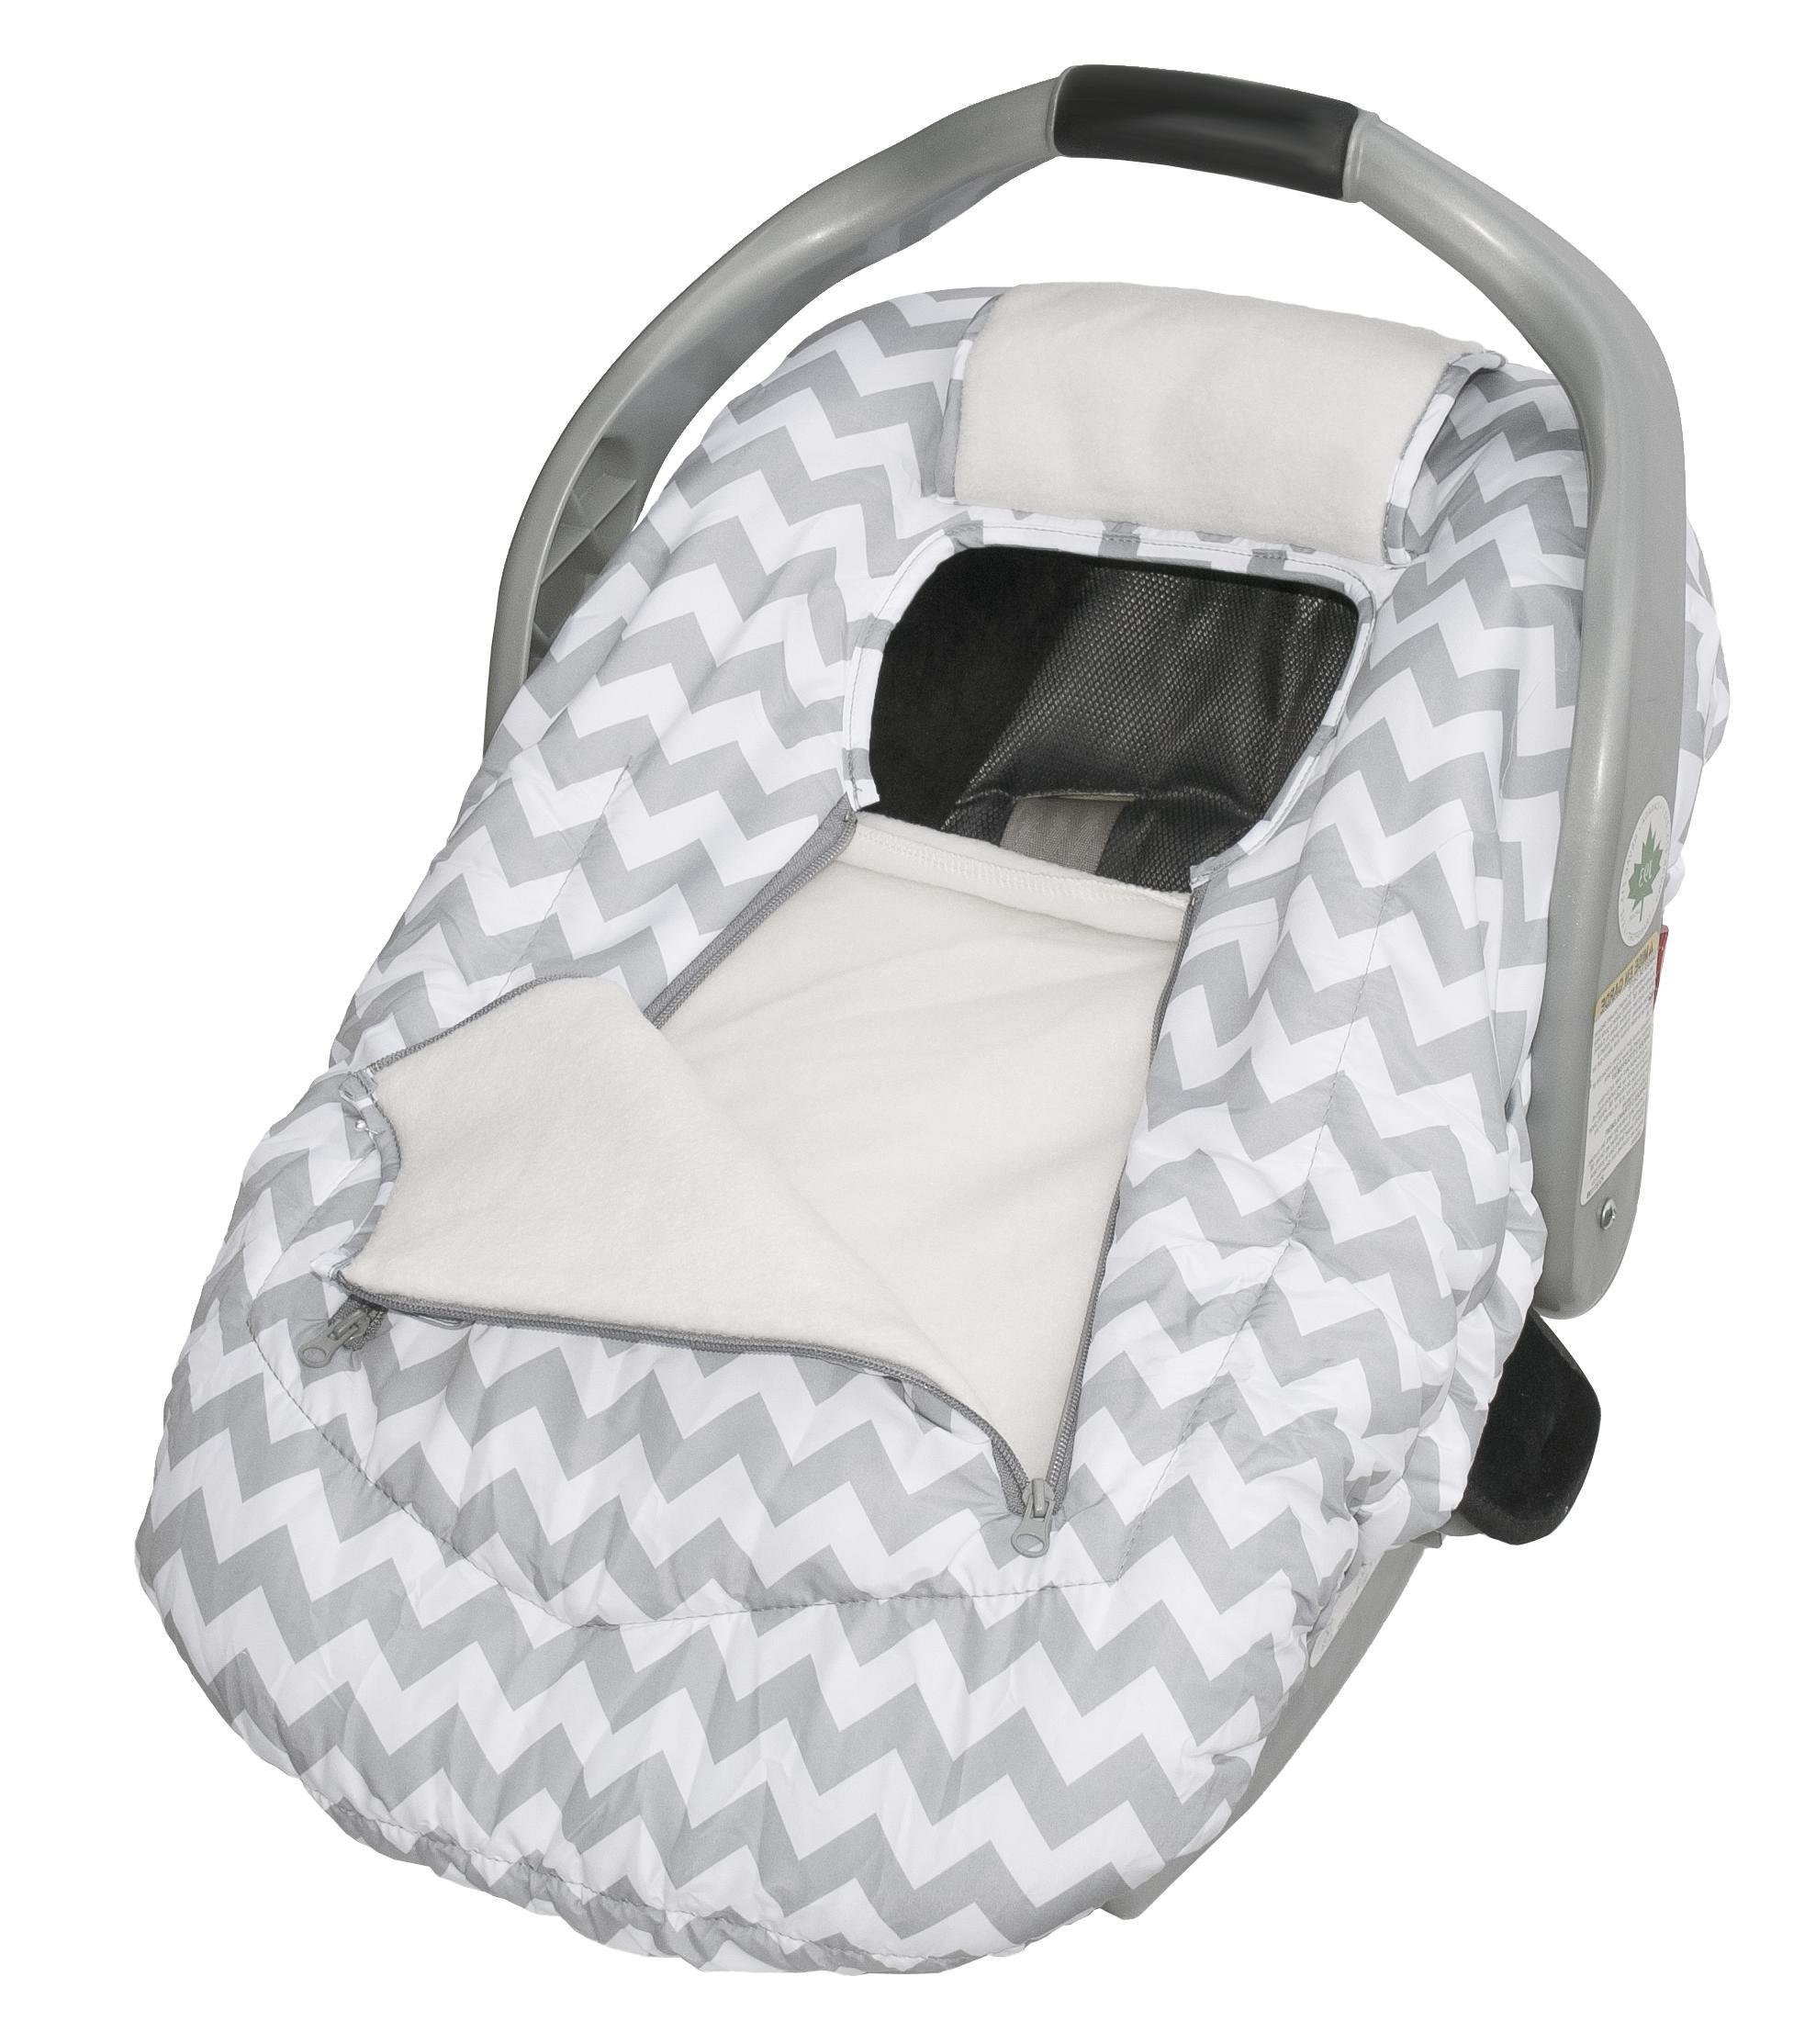 b710bb5515ac Buy Jolly Jumper Arctic Sneak A Peek Infant Car Seat Cover (Grey) in ...